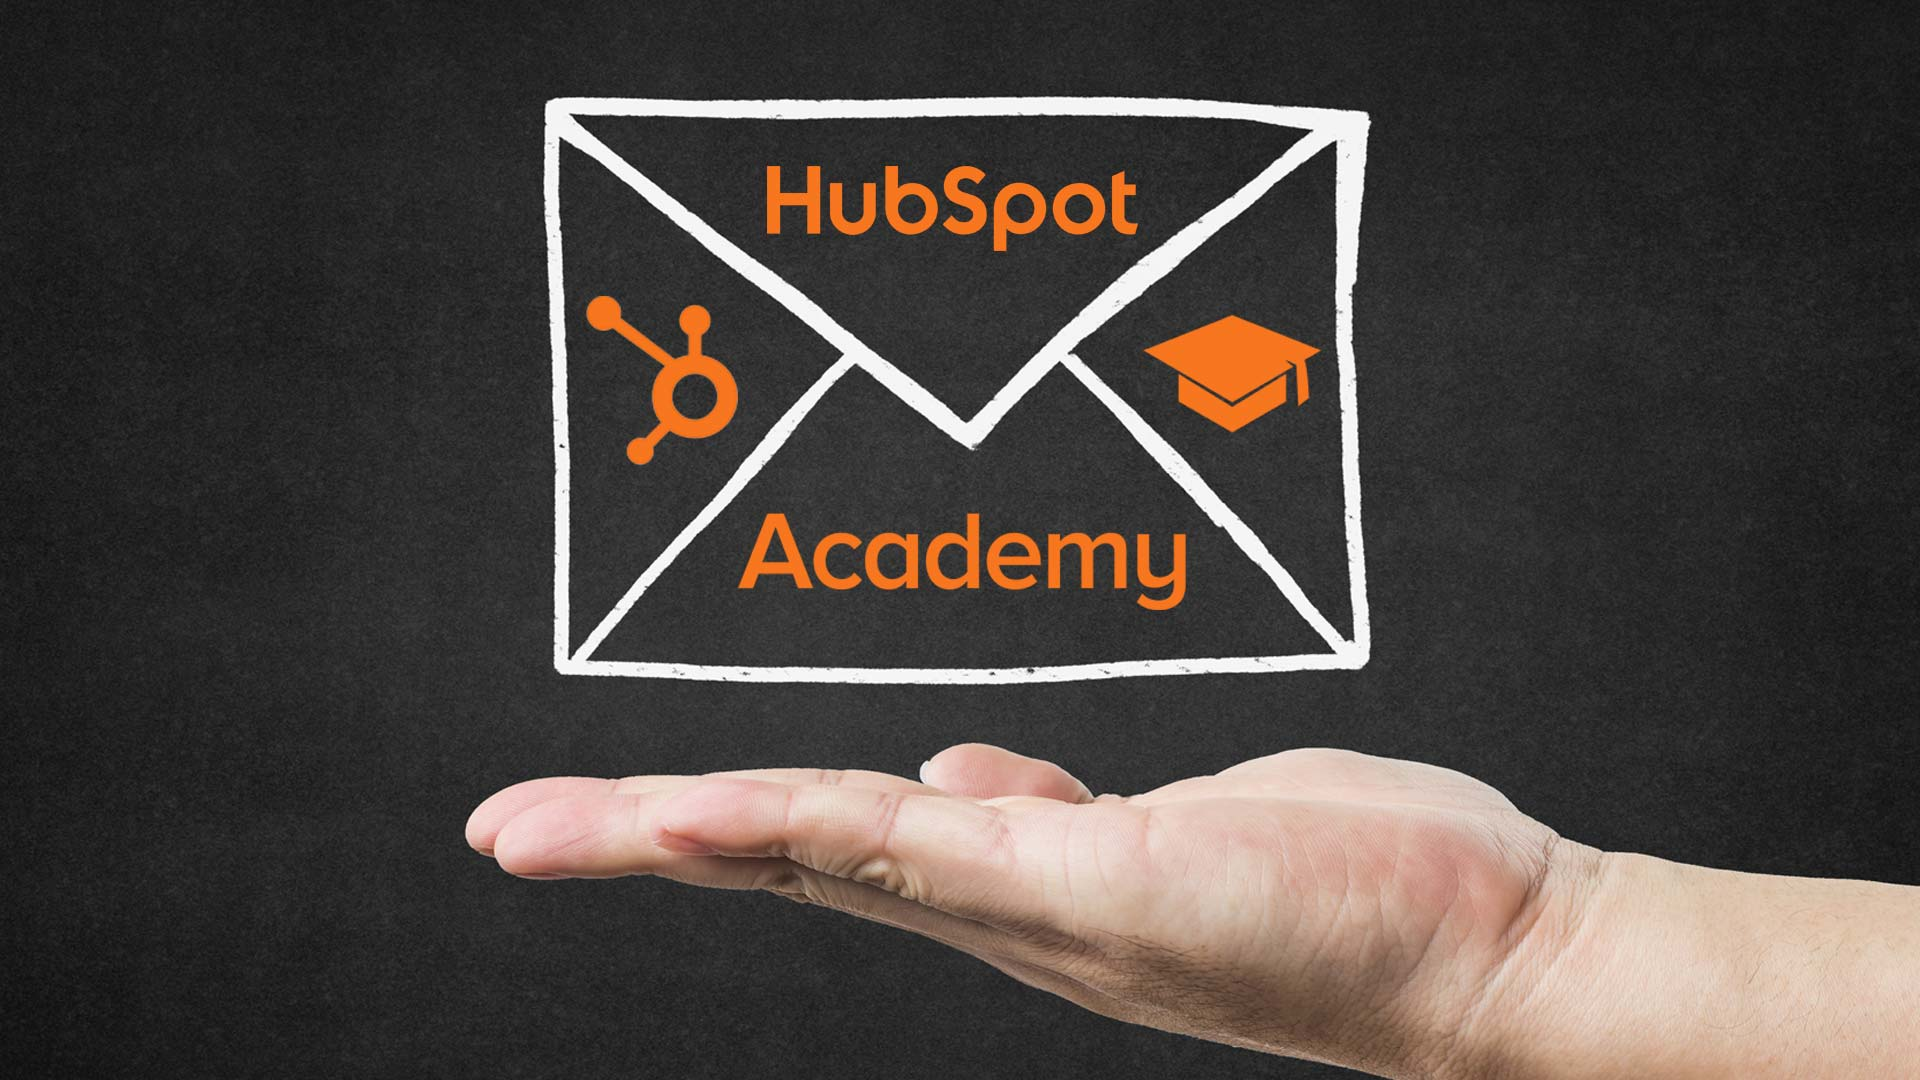 Consigli email marketing   Approfondisci con la HubSpot Academy